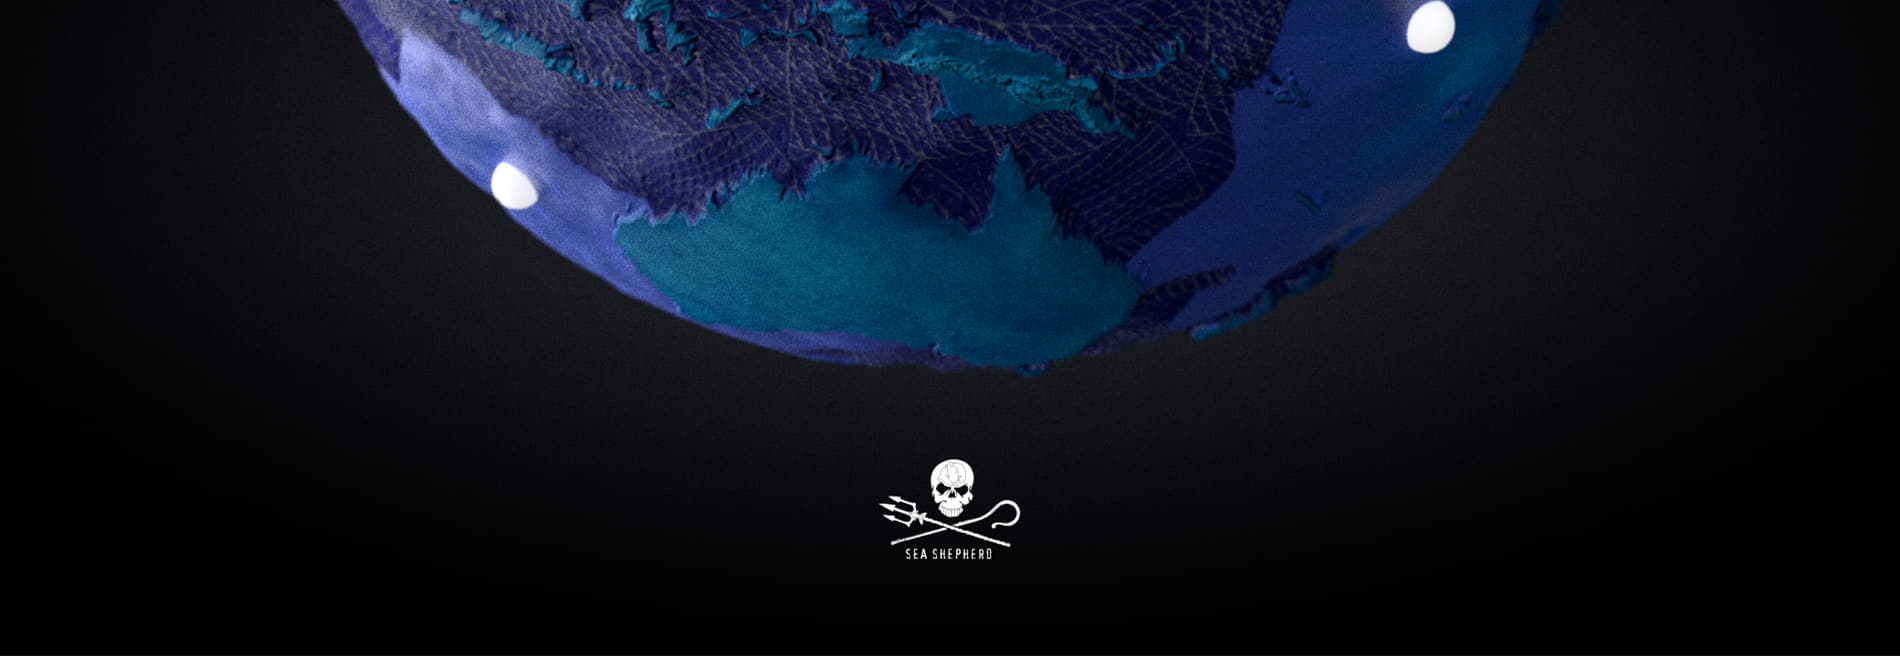 Sea Shepherd - No Fishing Net by Makemepulse wins Site of the Month January 2021